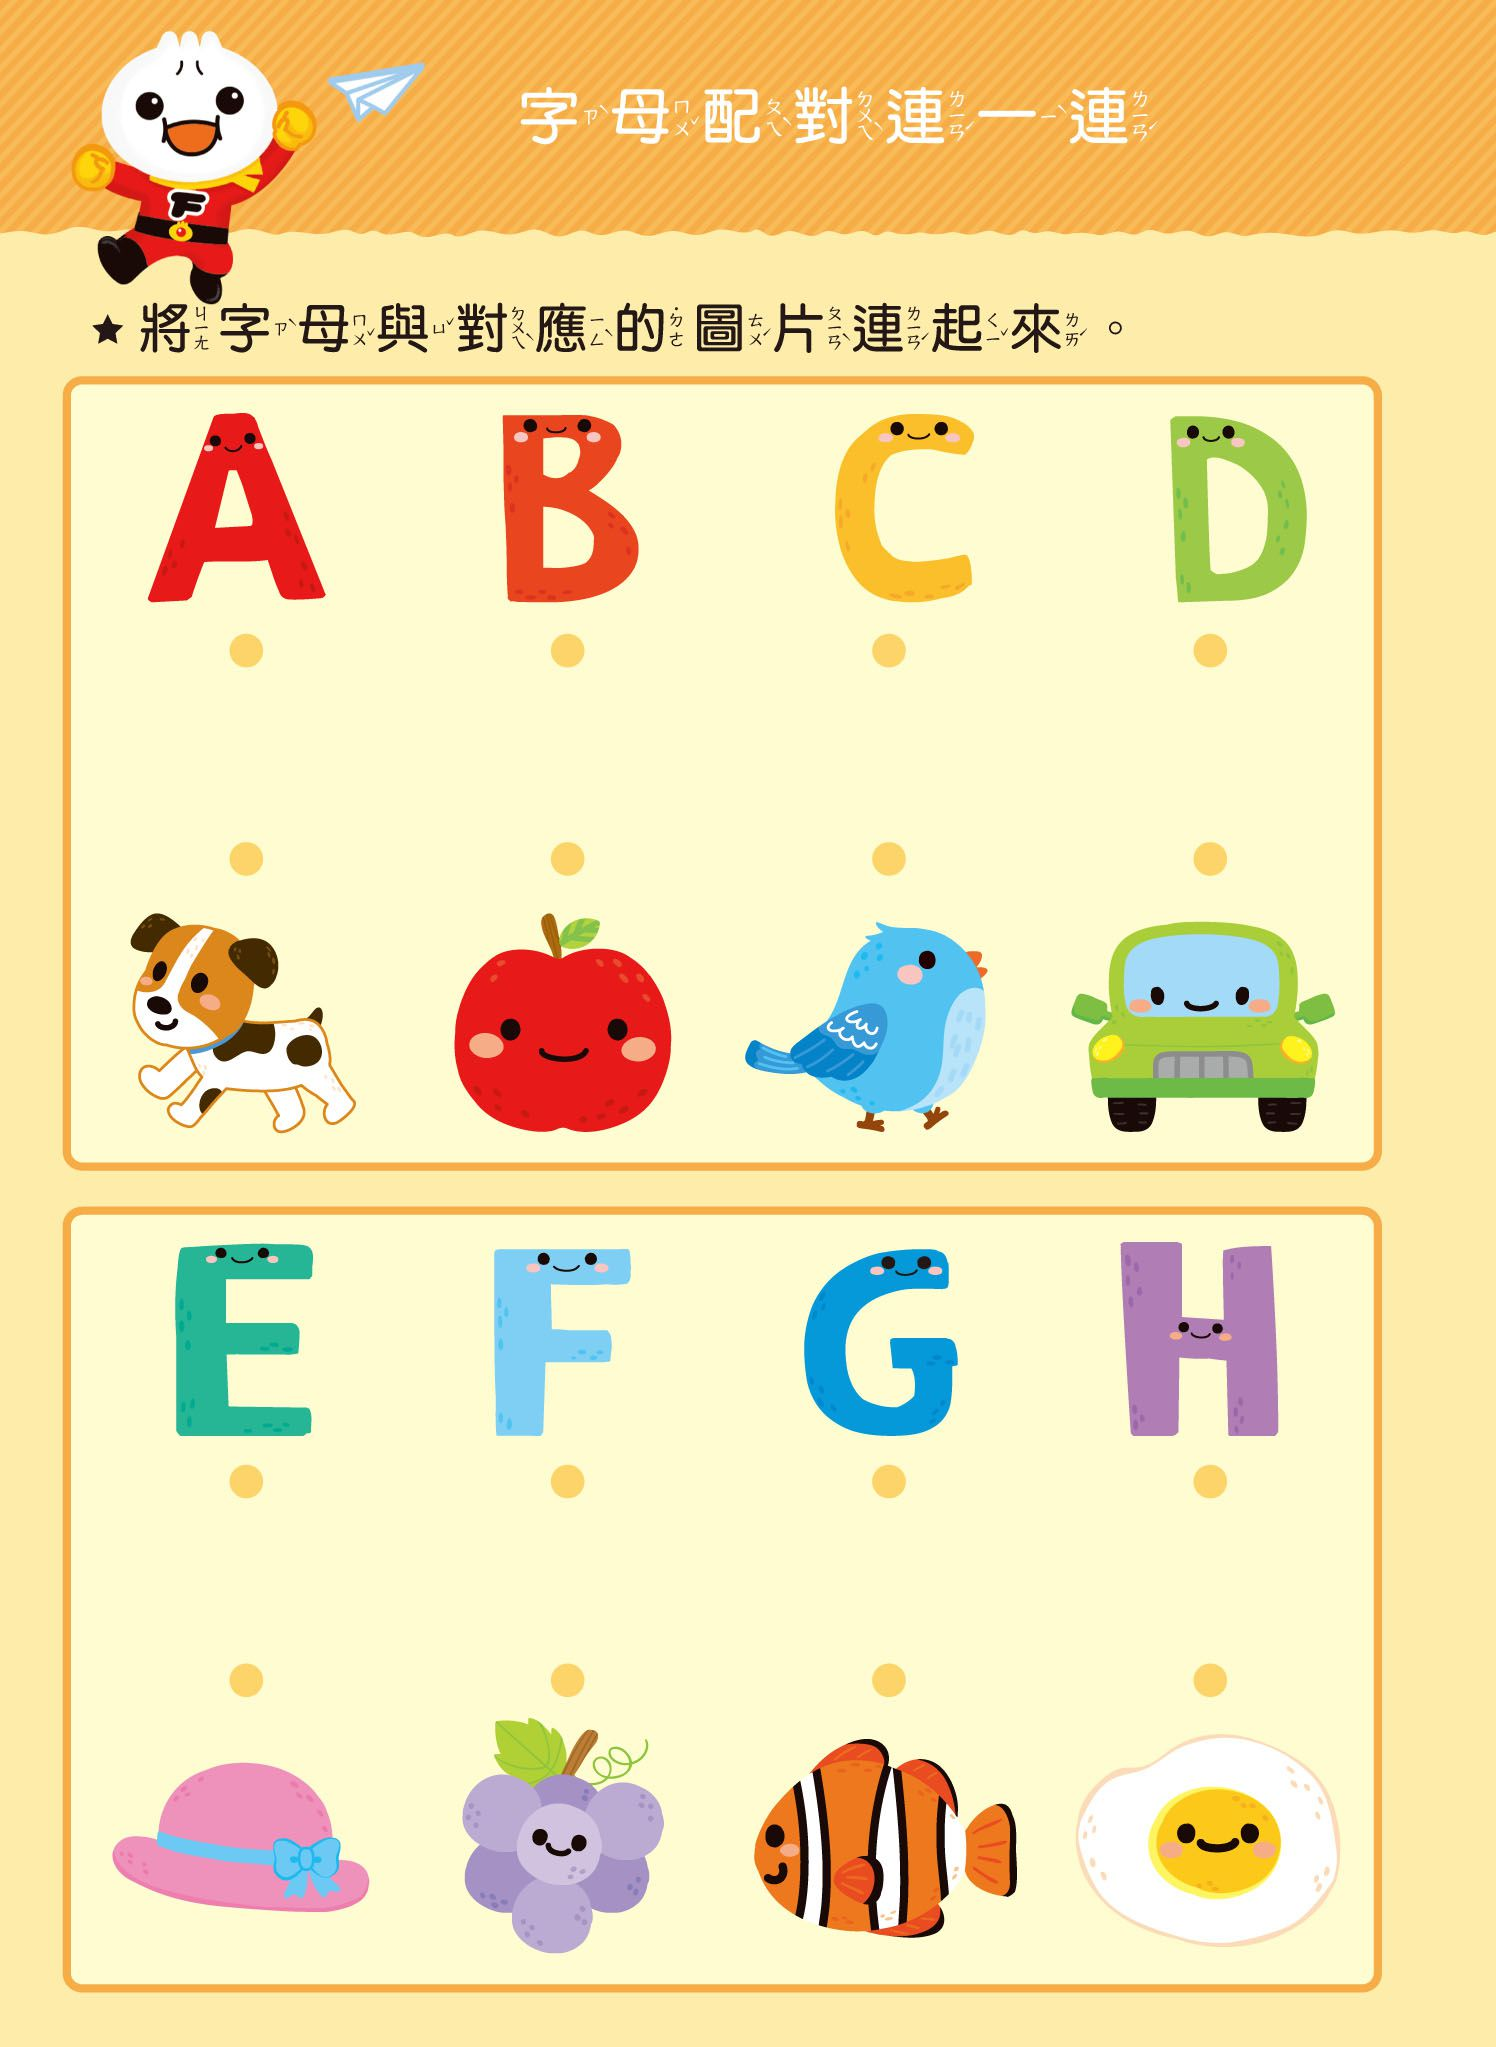 ABC-FOOD超人寶貝學前練習